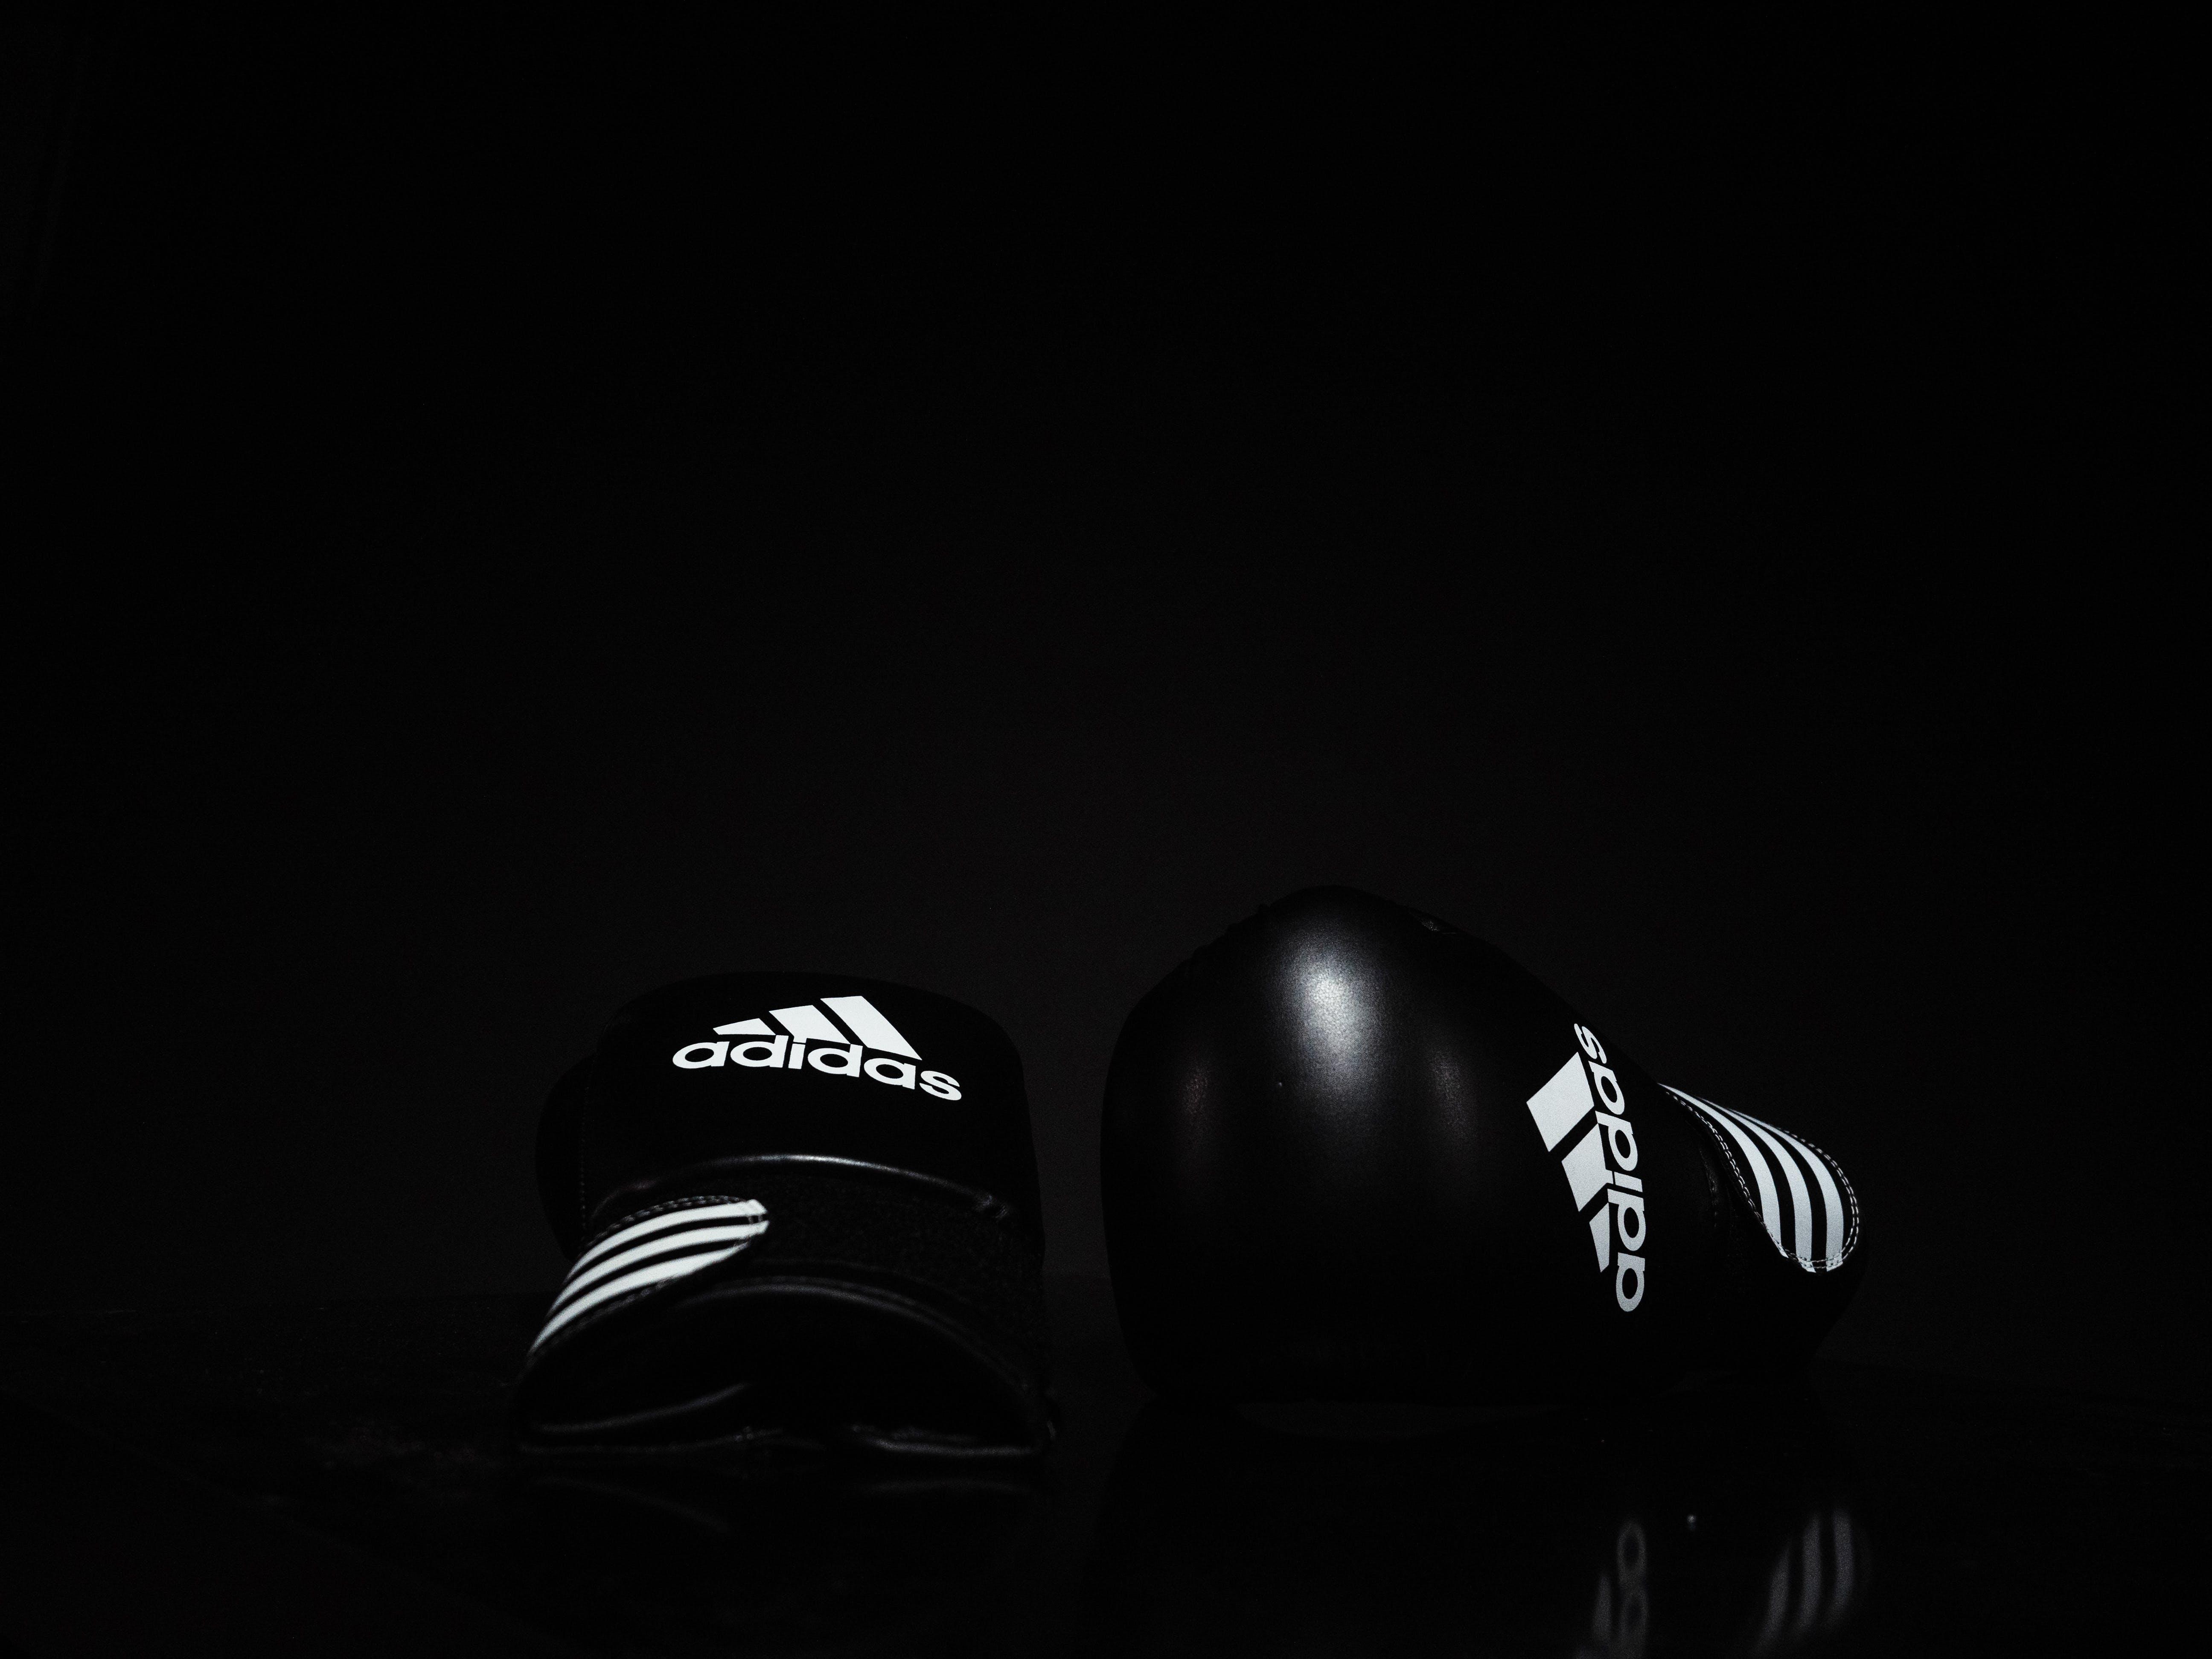 Free stock photo of boxing, adidas, background, boxing gloves